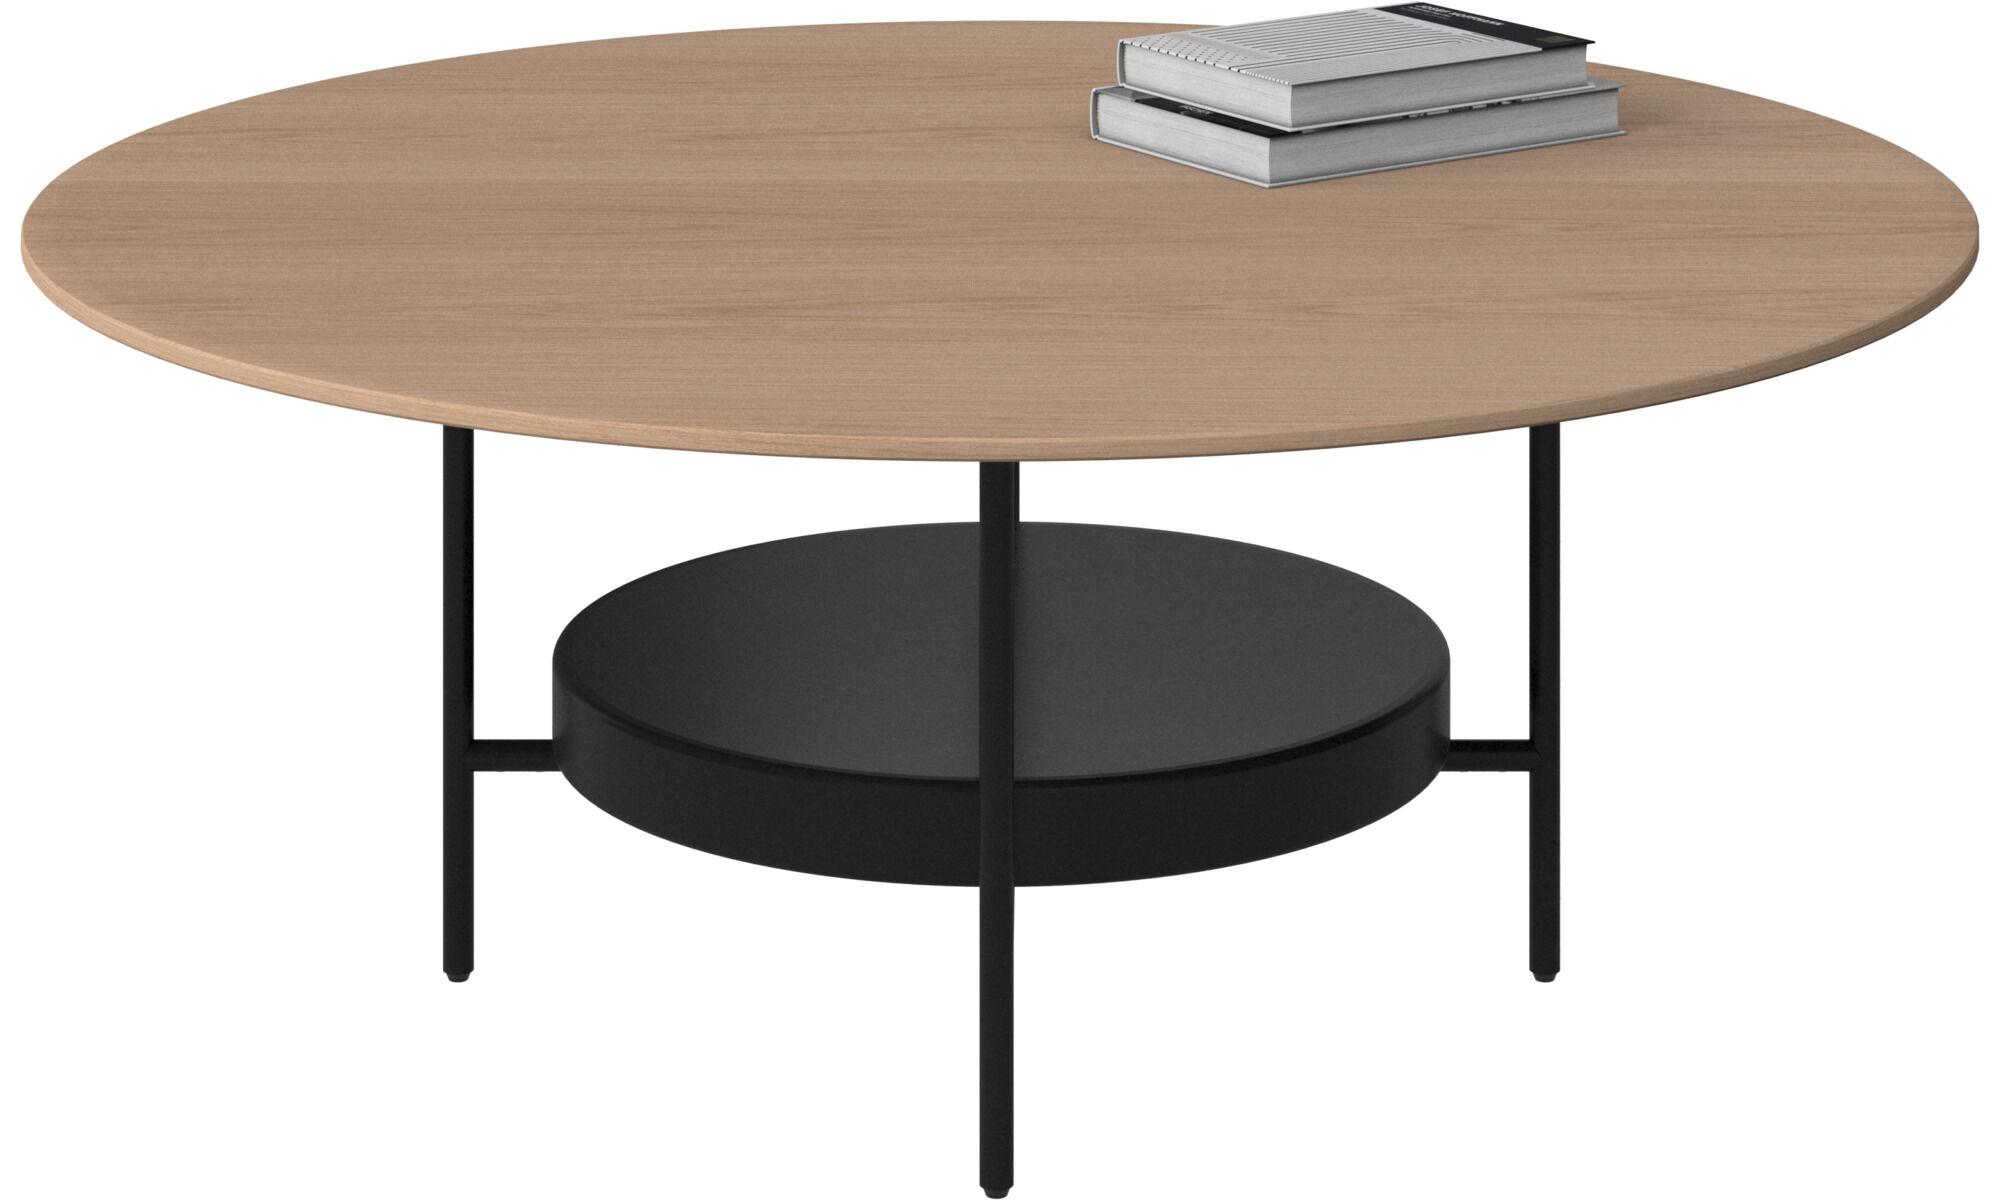 Qualité Boconcept Modernes Tables Basses 3lJcF1TK